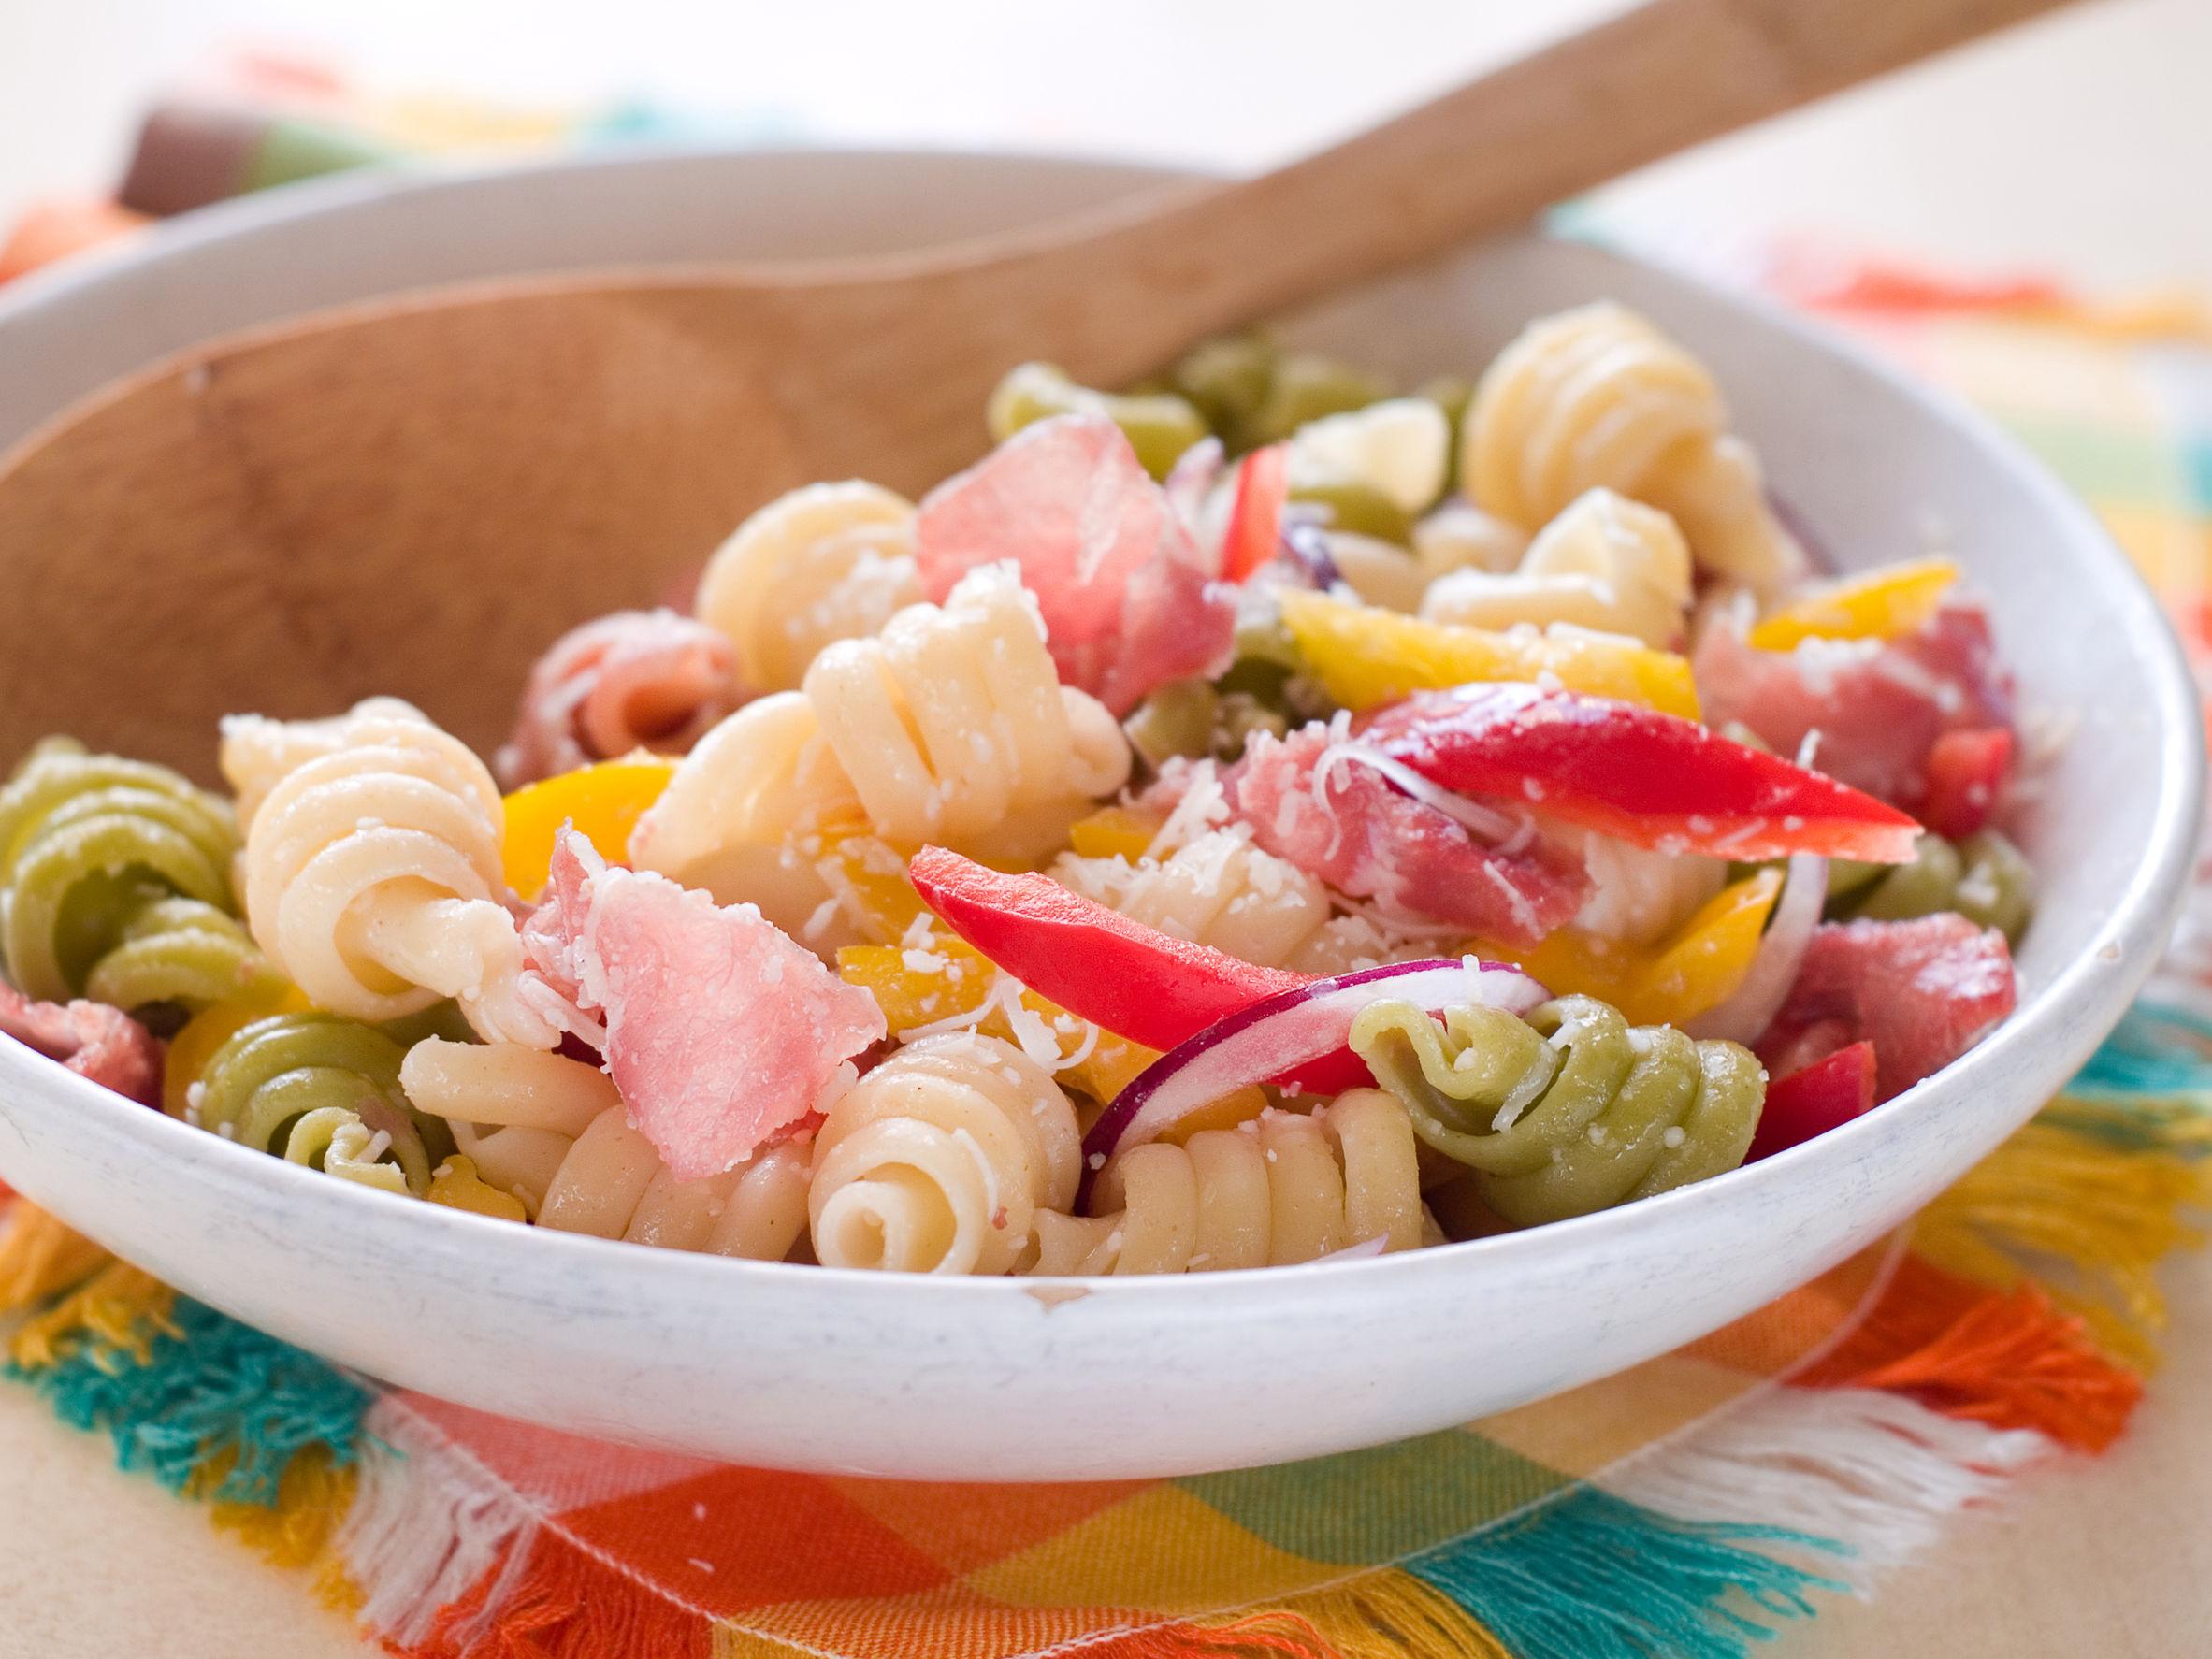 Ask a Chef: Potato and pasta salads | KSL.com